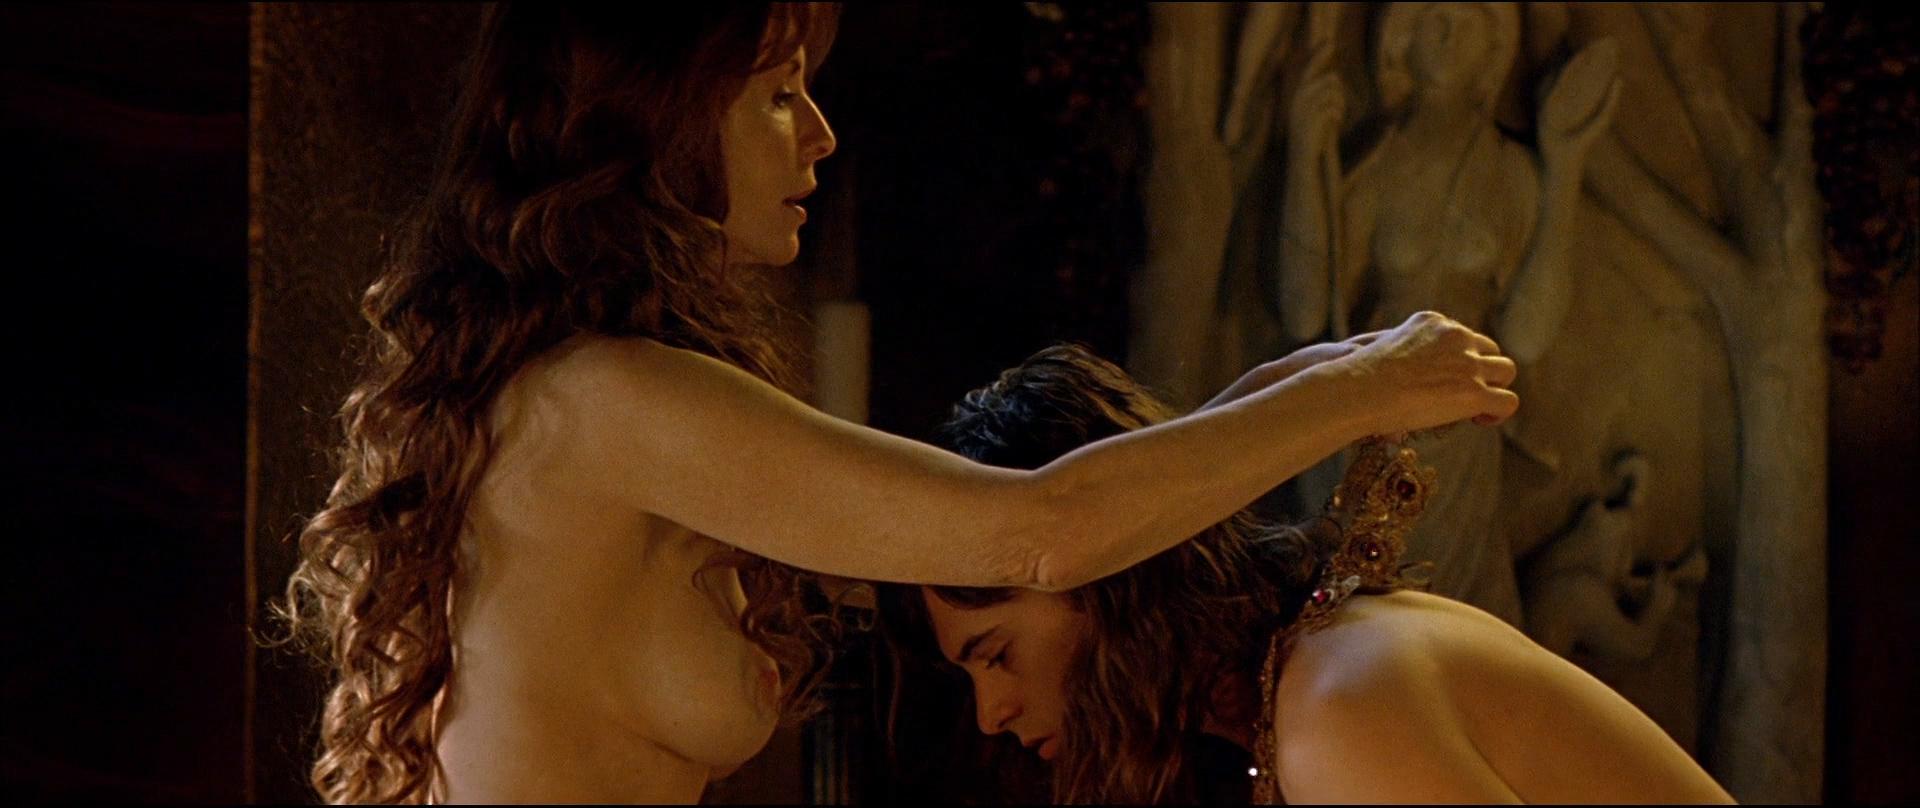 The duchess scene nude, malayalam sex girls photo